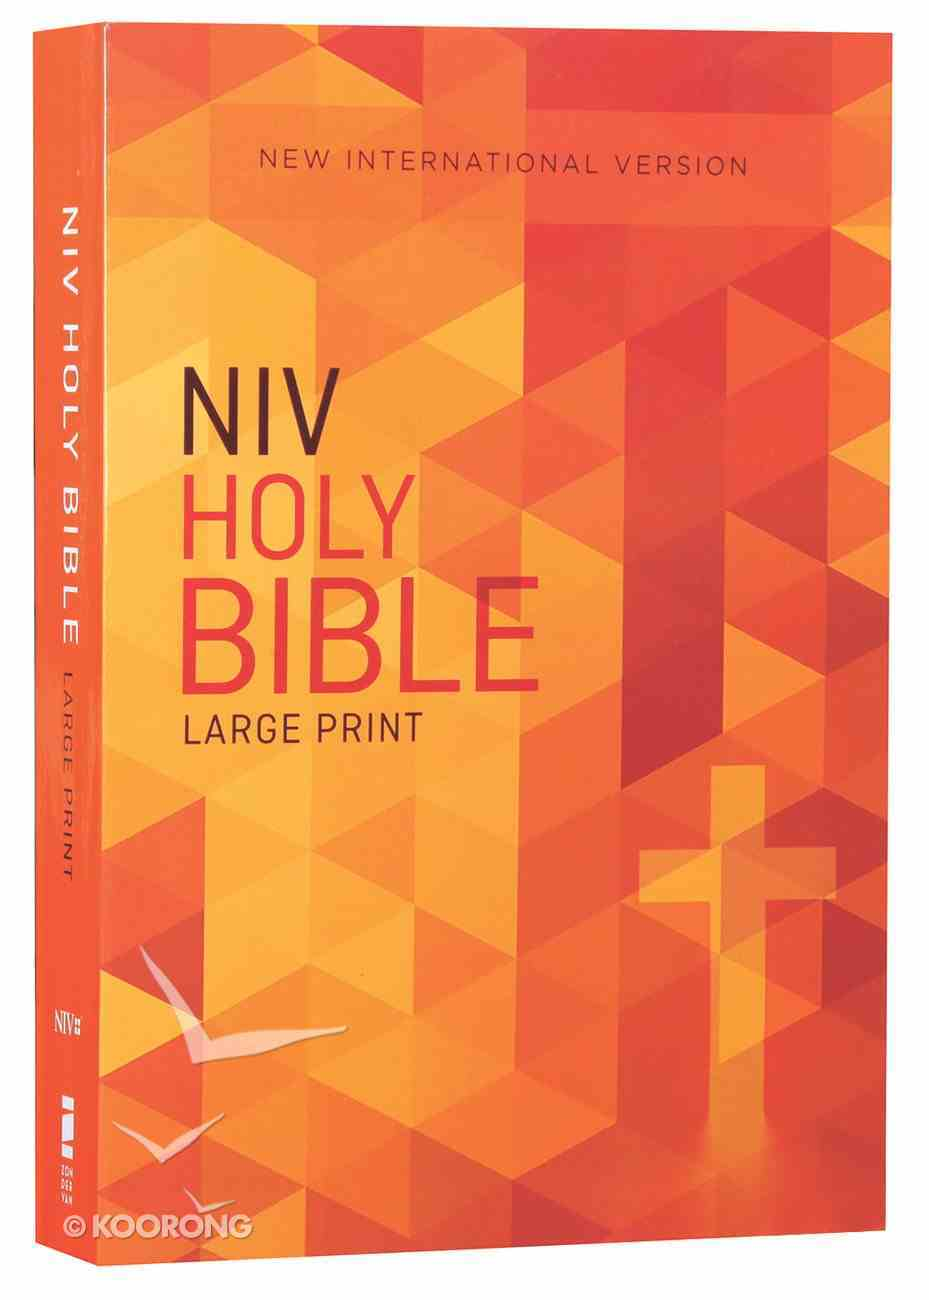 NIV Outreach Bible Large Print Orange Cross (Black Letter Edition) Paperback